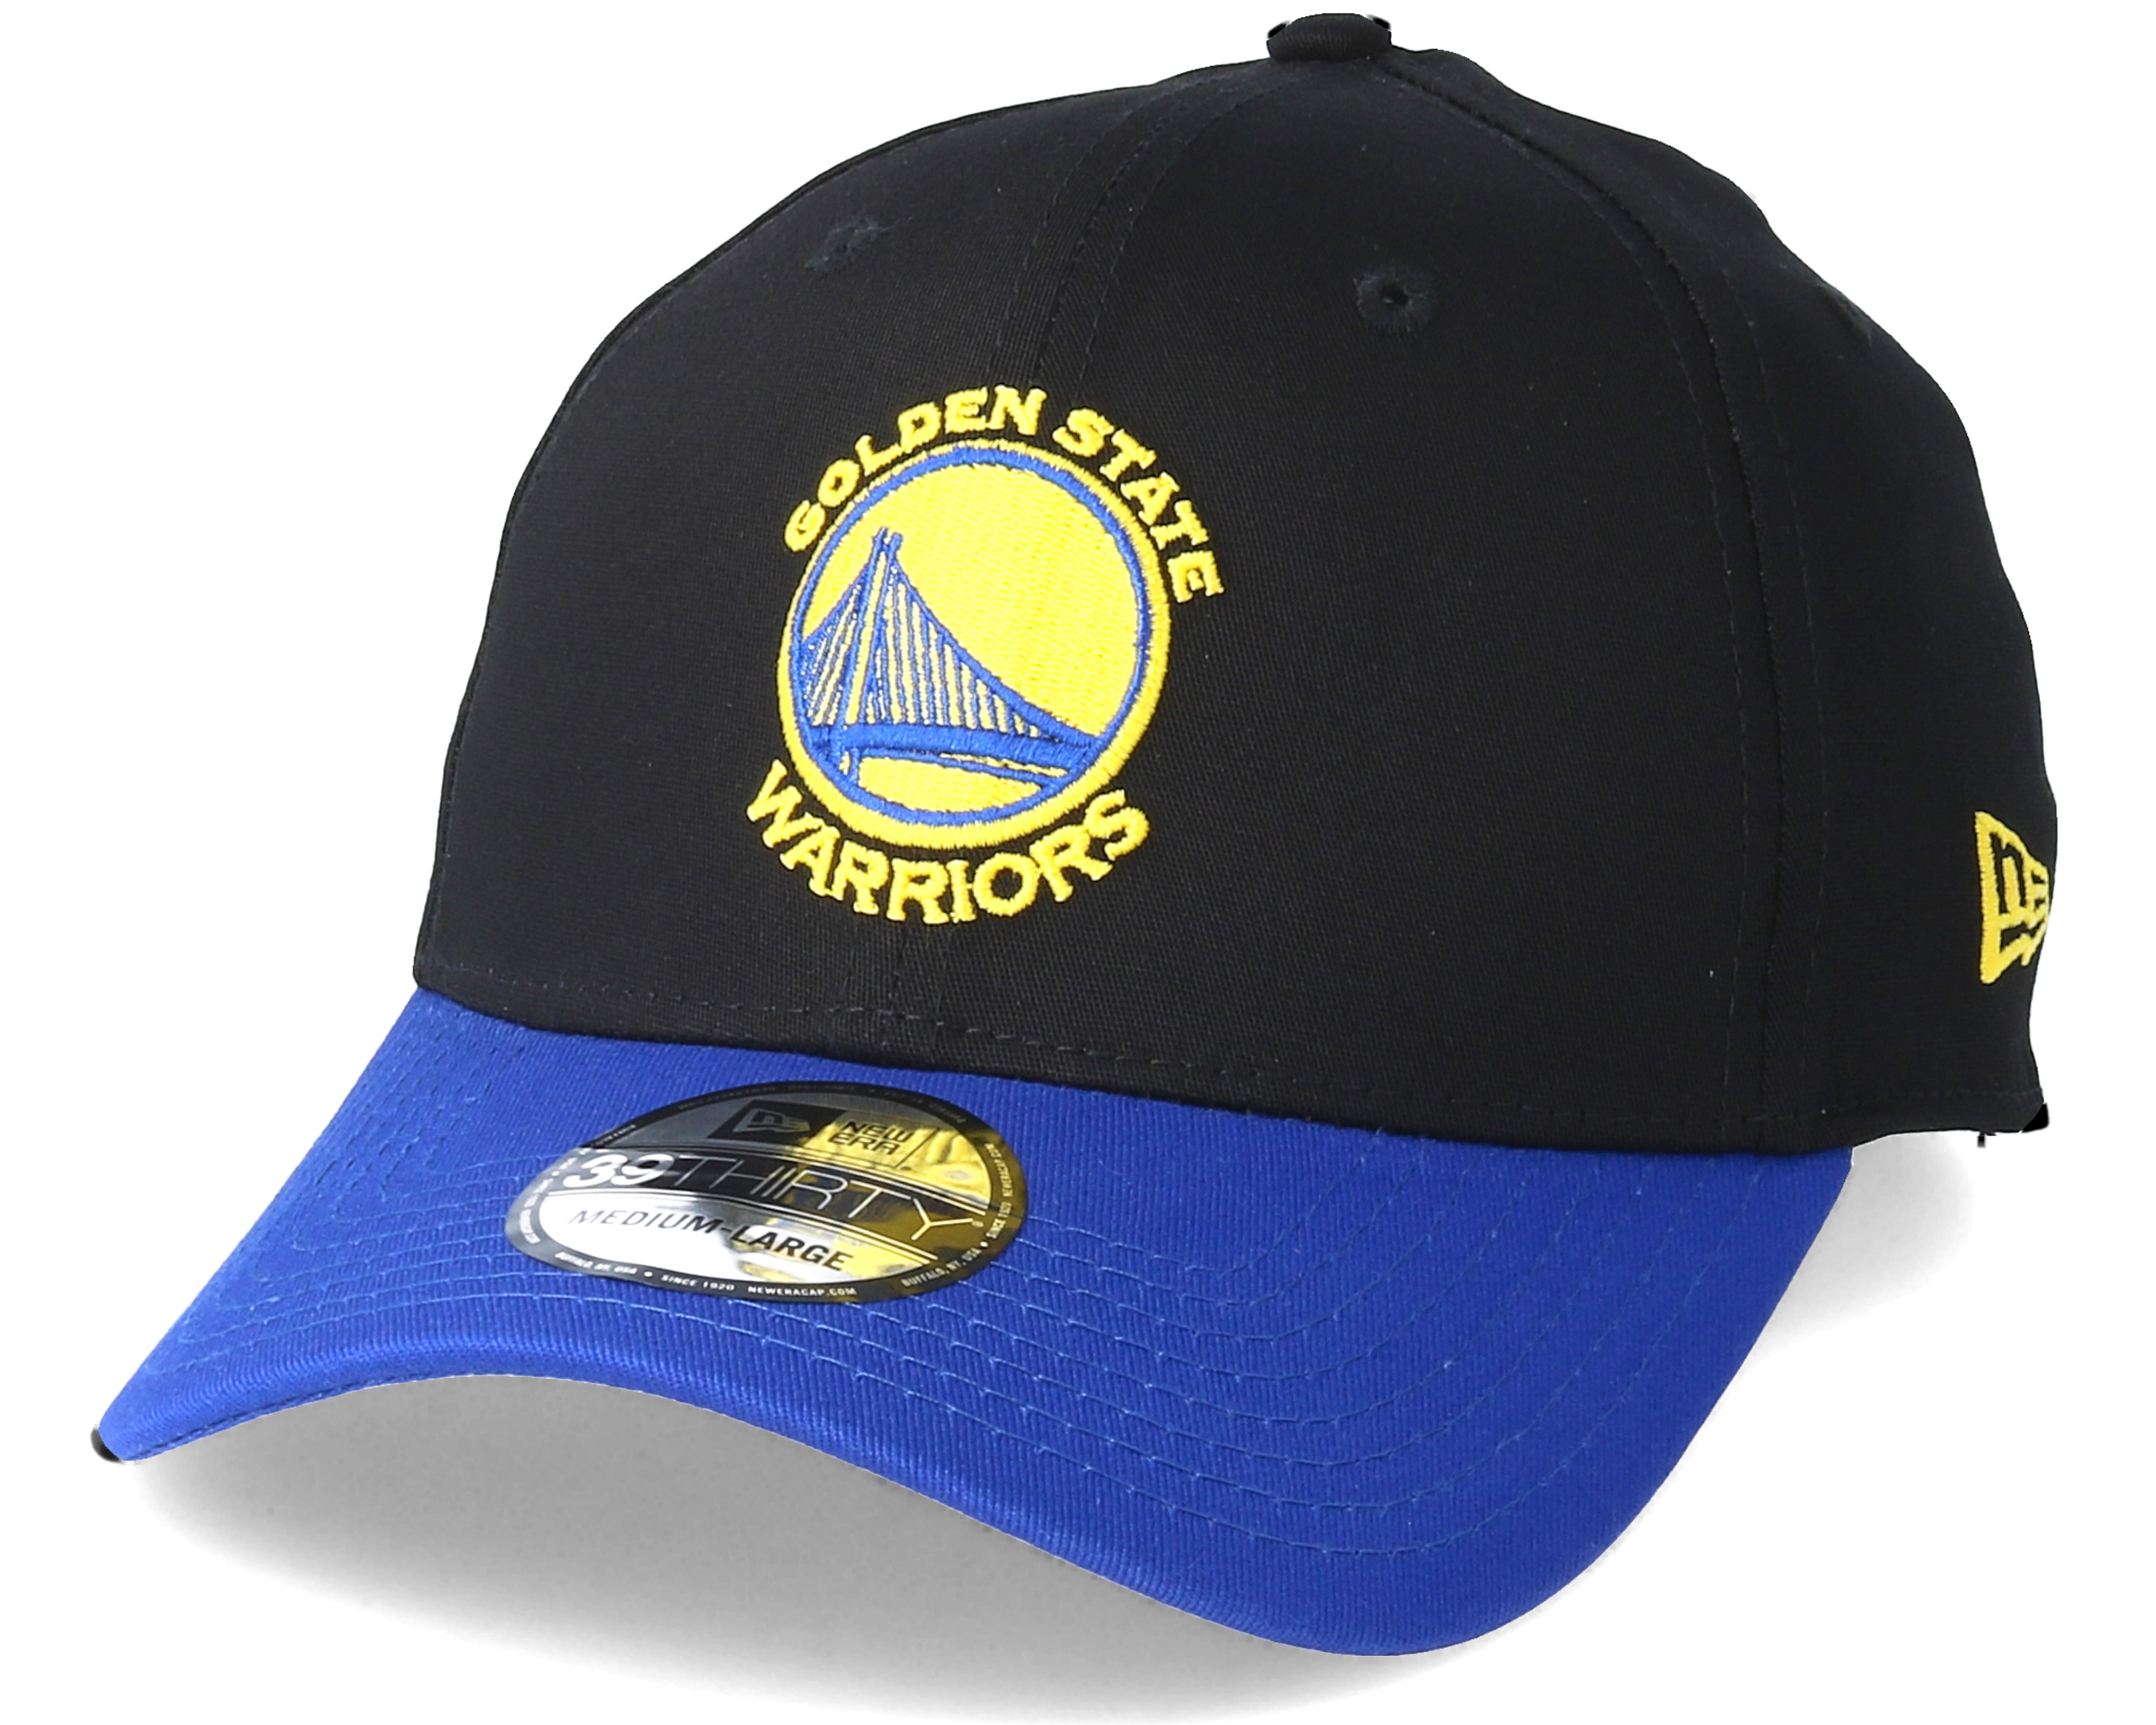 Golden State Warriors Black Base 39Thirty Black Flexfit - New Era ... 2583cda15e6